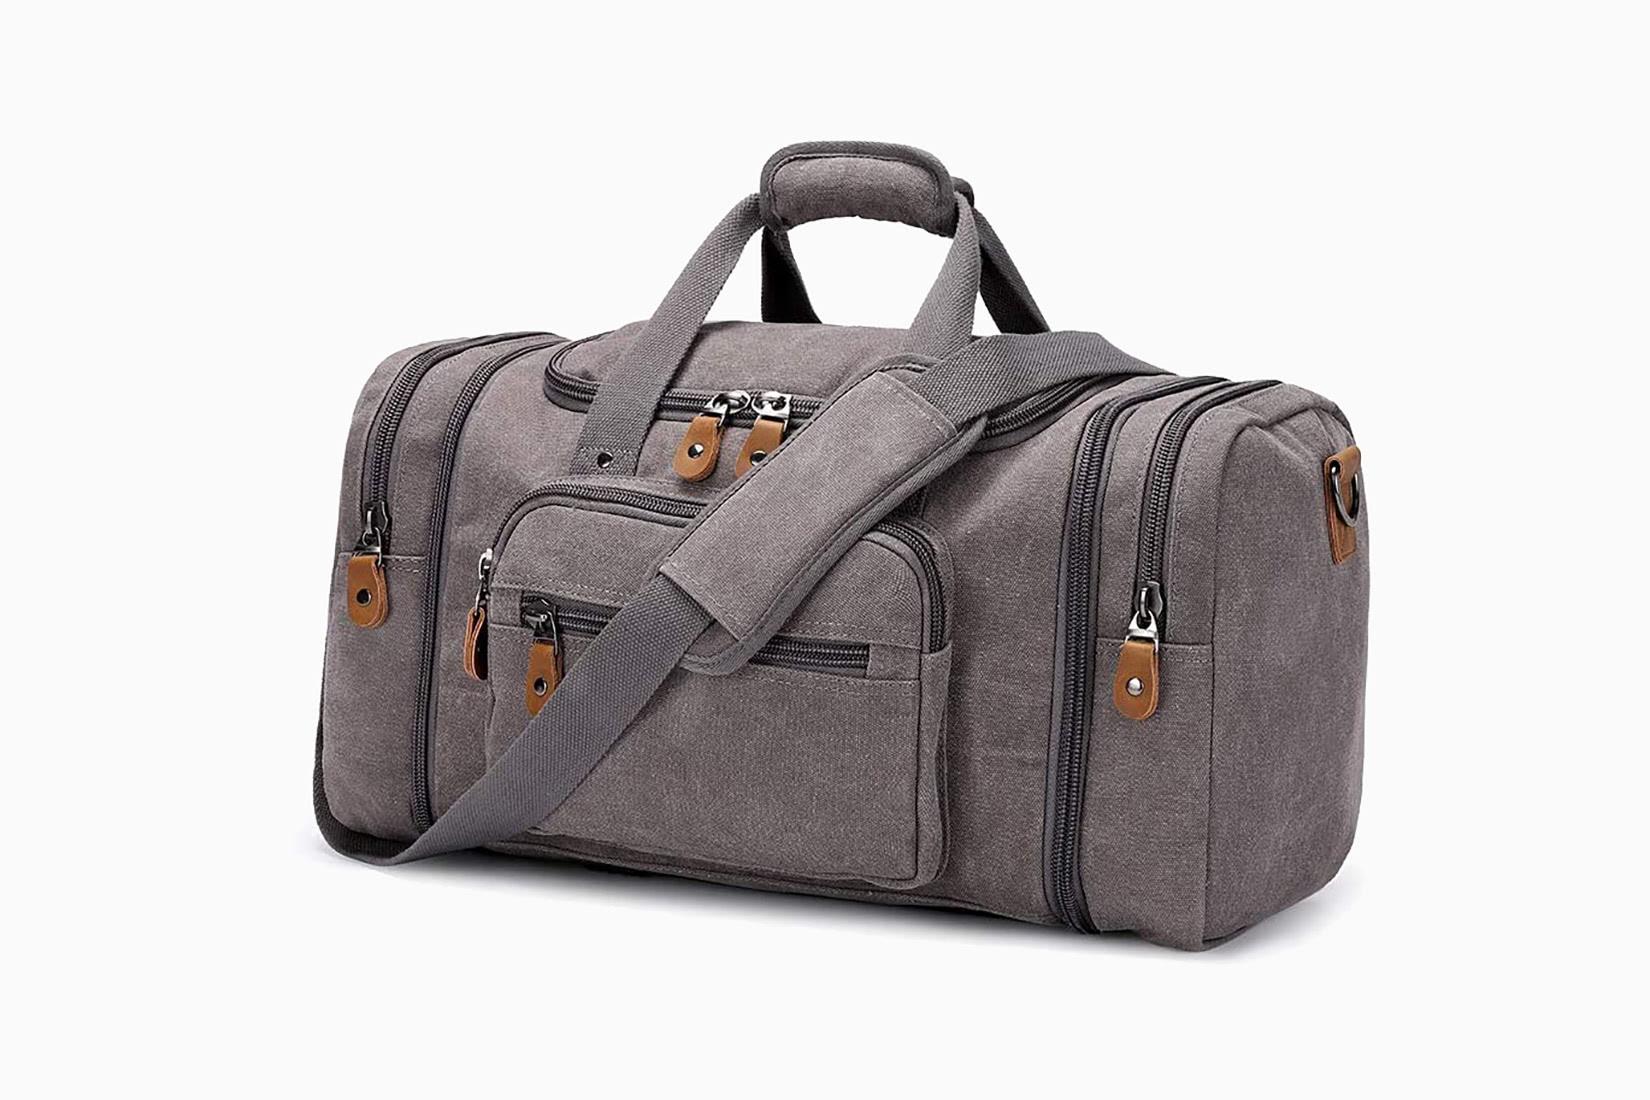 best duffel bags laptop plambag - Luxe Digital